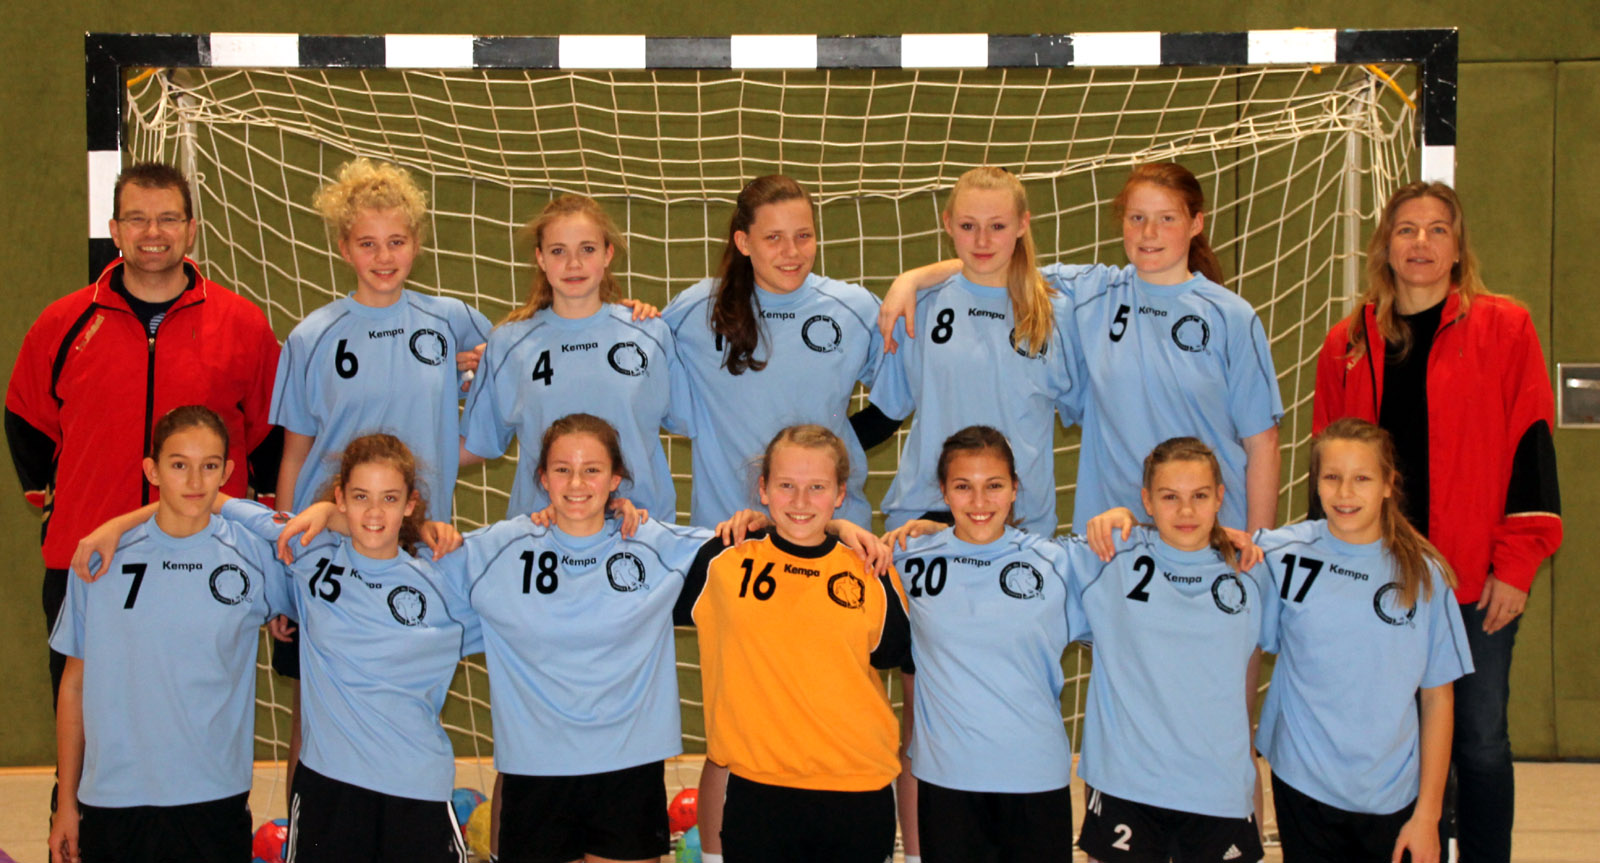 Hessischer Handballverband Bezirk Darmstadt Methodik